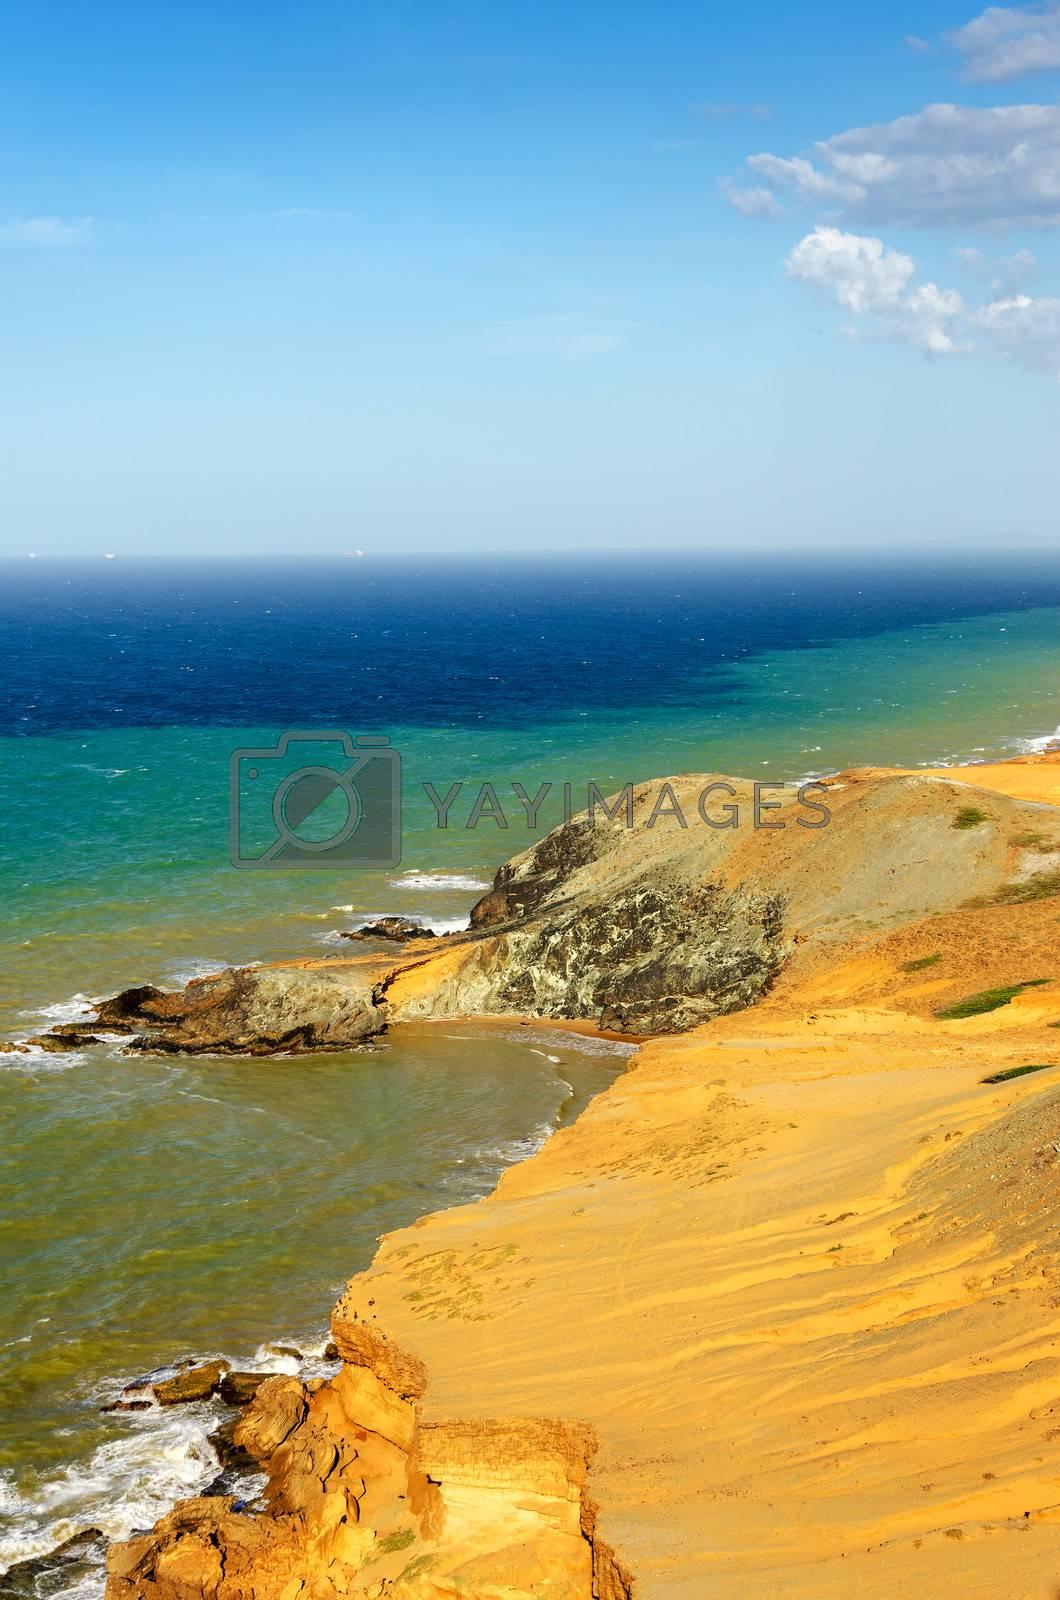 View of a dry desert coastline and the Caribbean Sea with various shades of blue near Cabo de la Vela in La Guajira, Colombia